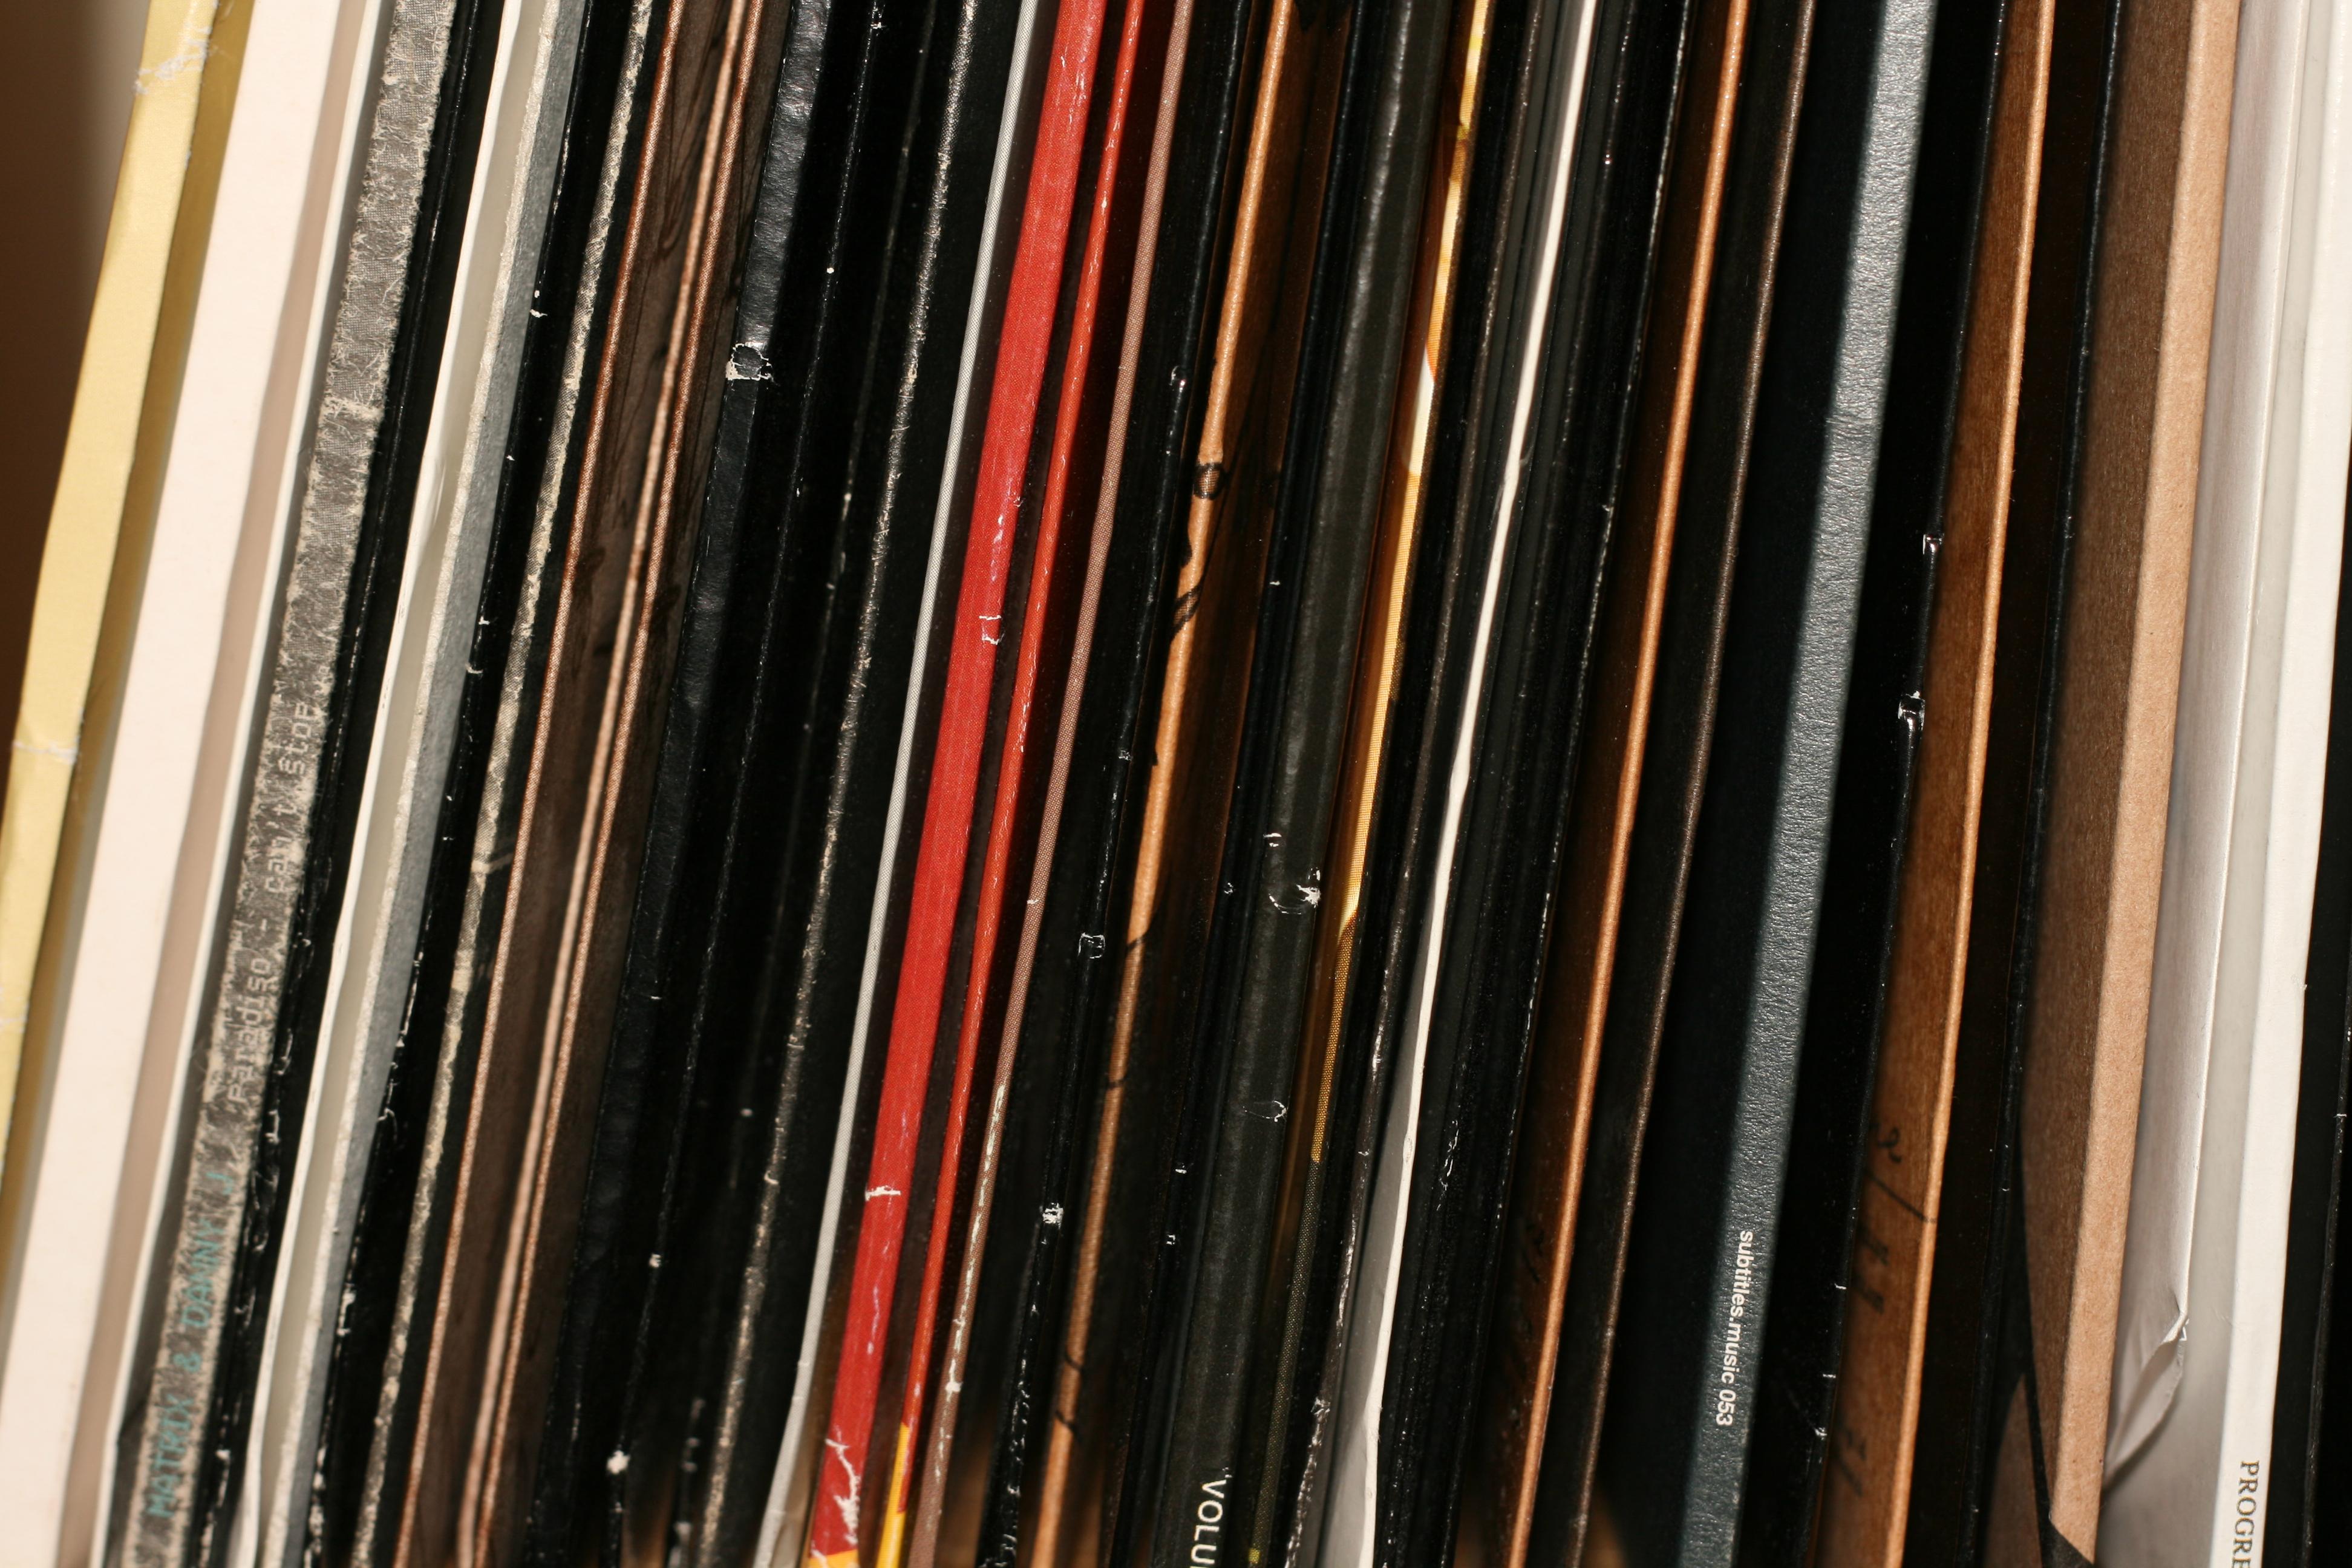 Records Vintage Vinyl Record Wallpaper 3888x2592